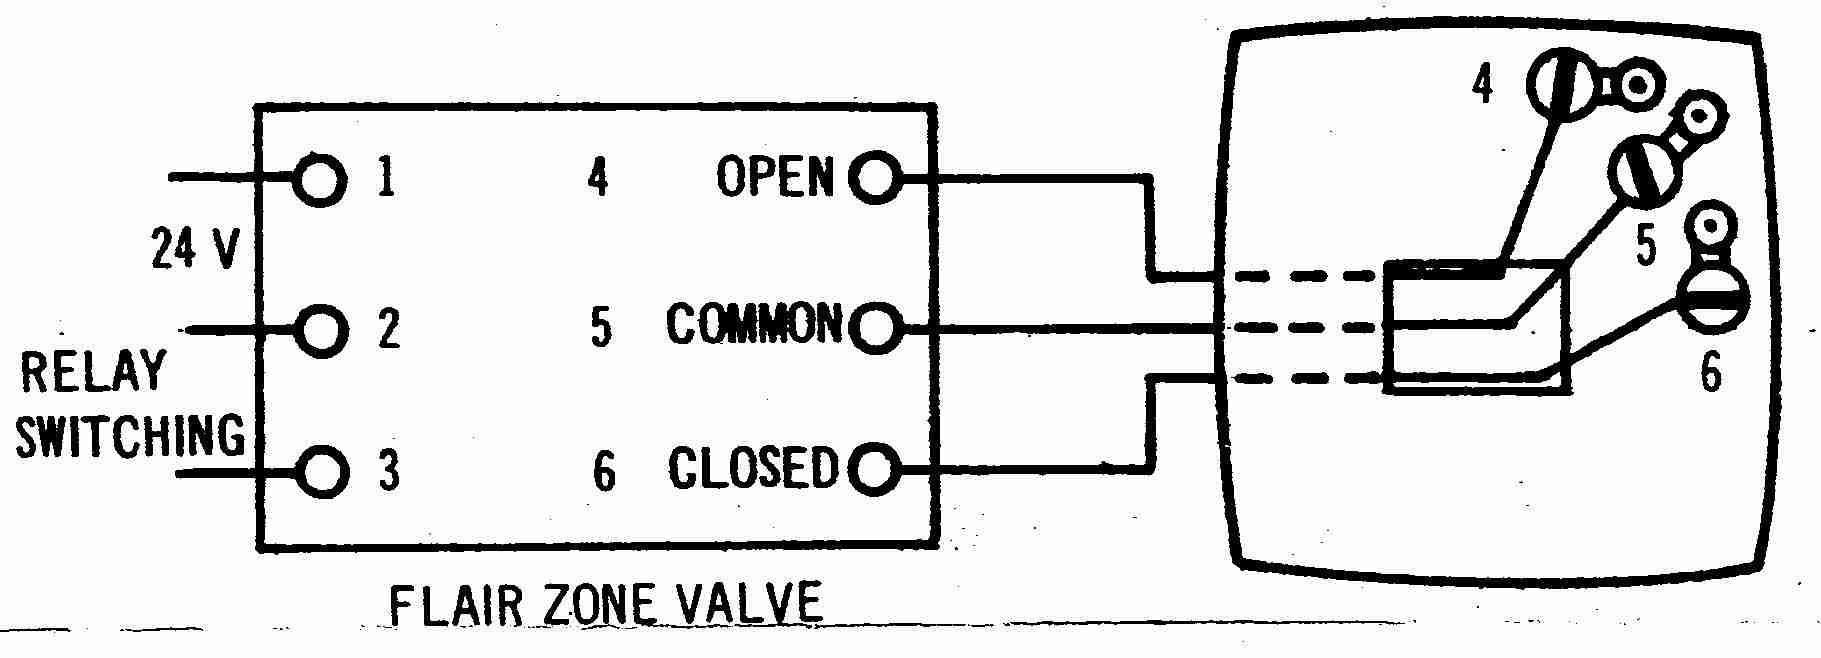 Diagram Kenwood Car Stereo Kdc 252u Wiring Diagram Full Version Hd Quality Wiring Diagram Automatedcode Ink3 It